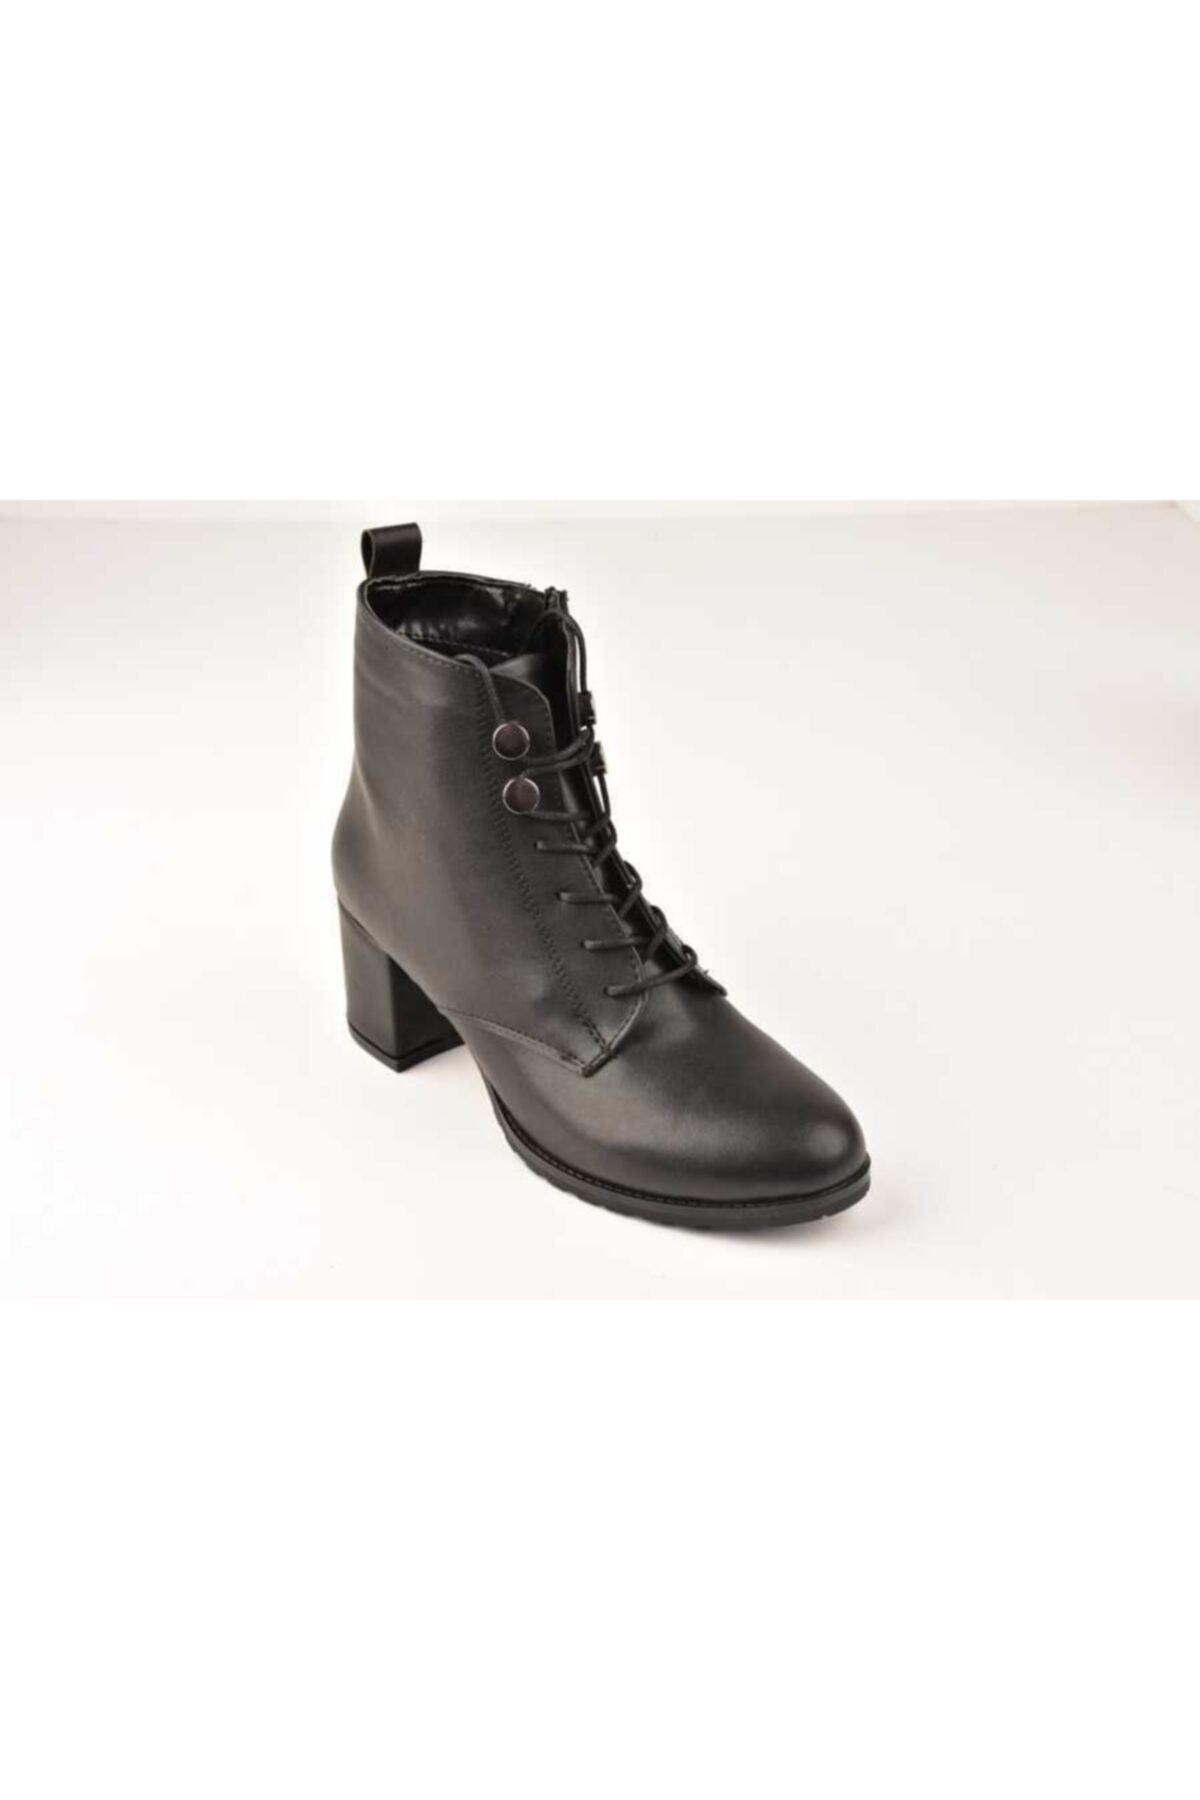 SWELLSOFT Kadın Siyah Swell Soft Cilt Bot Ayakkabı 1720-20k